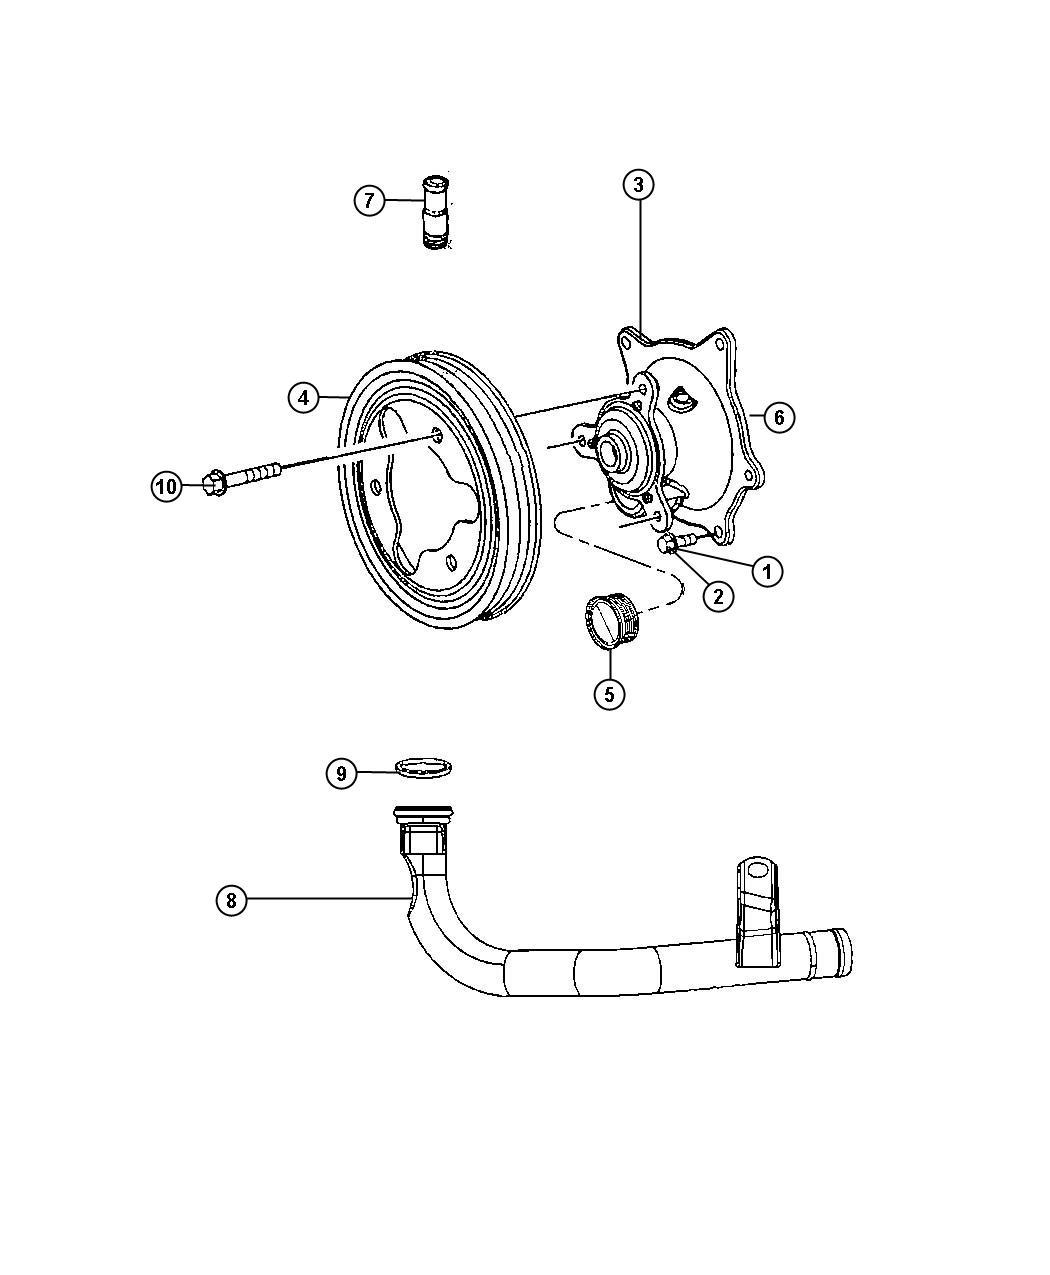 1996 pontiac grand prix cooling fan wiring diagram